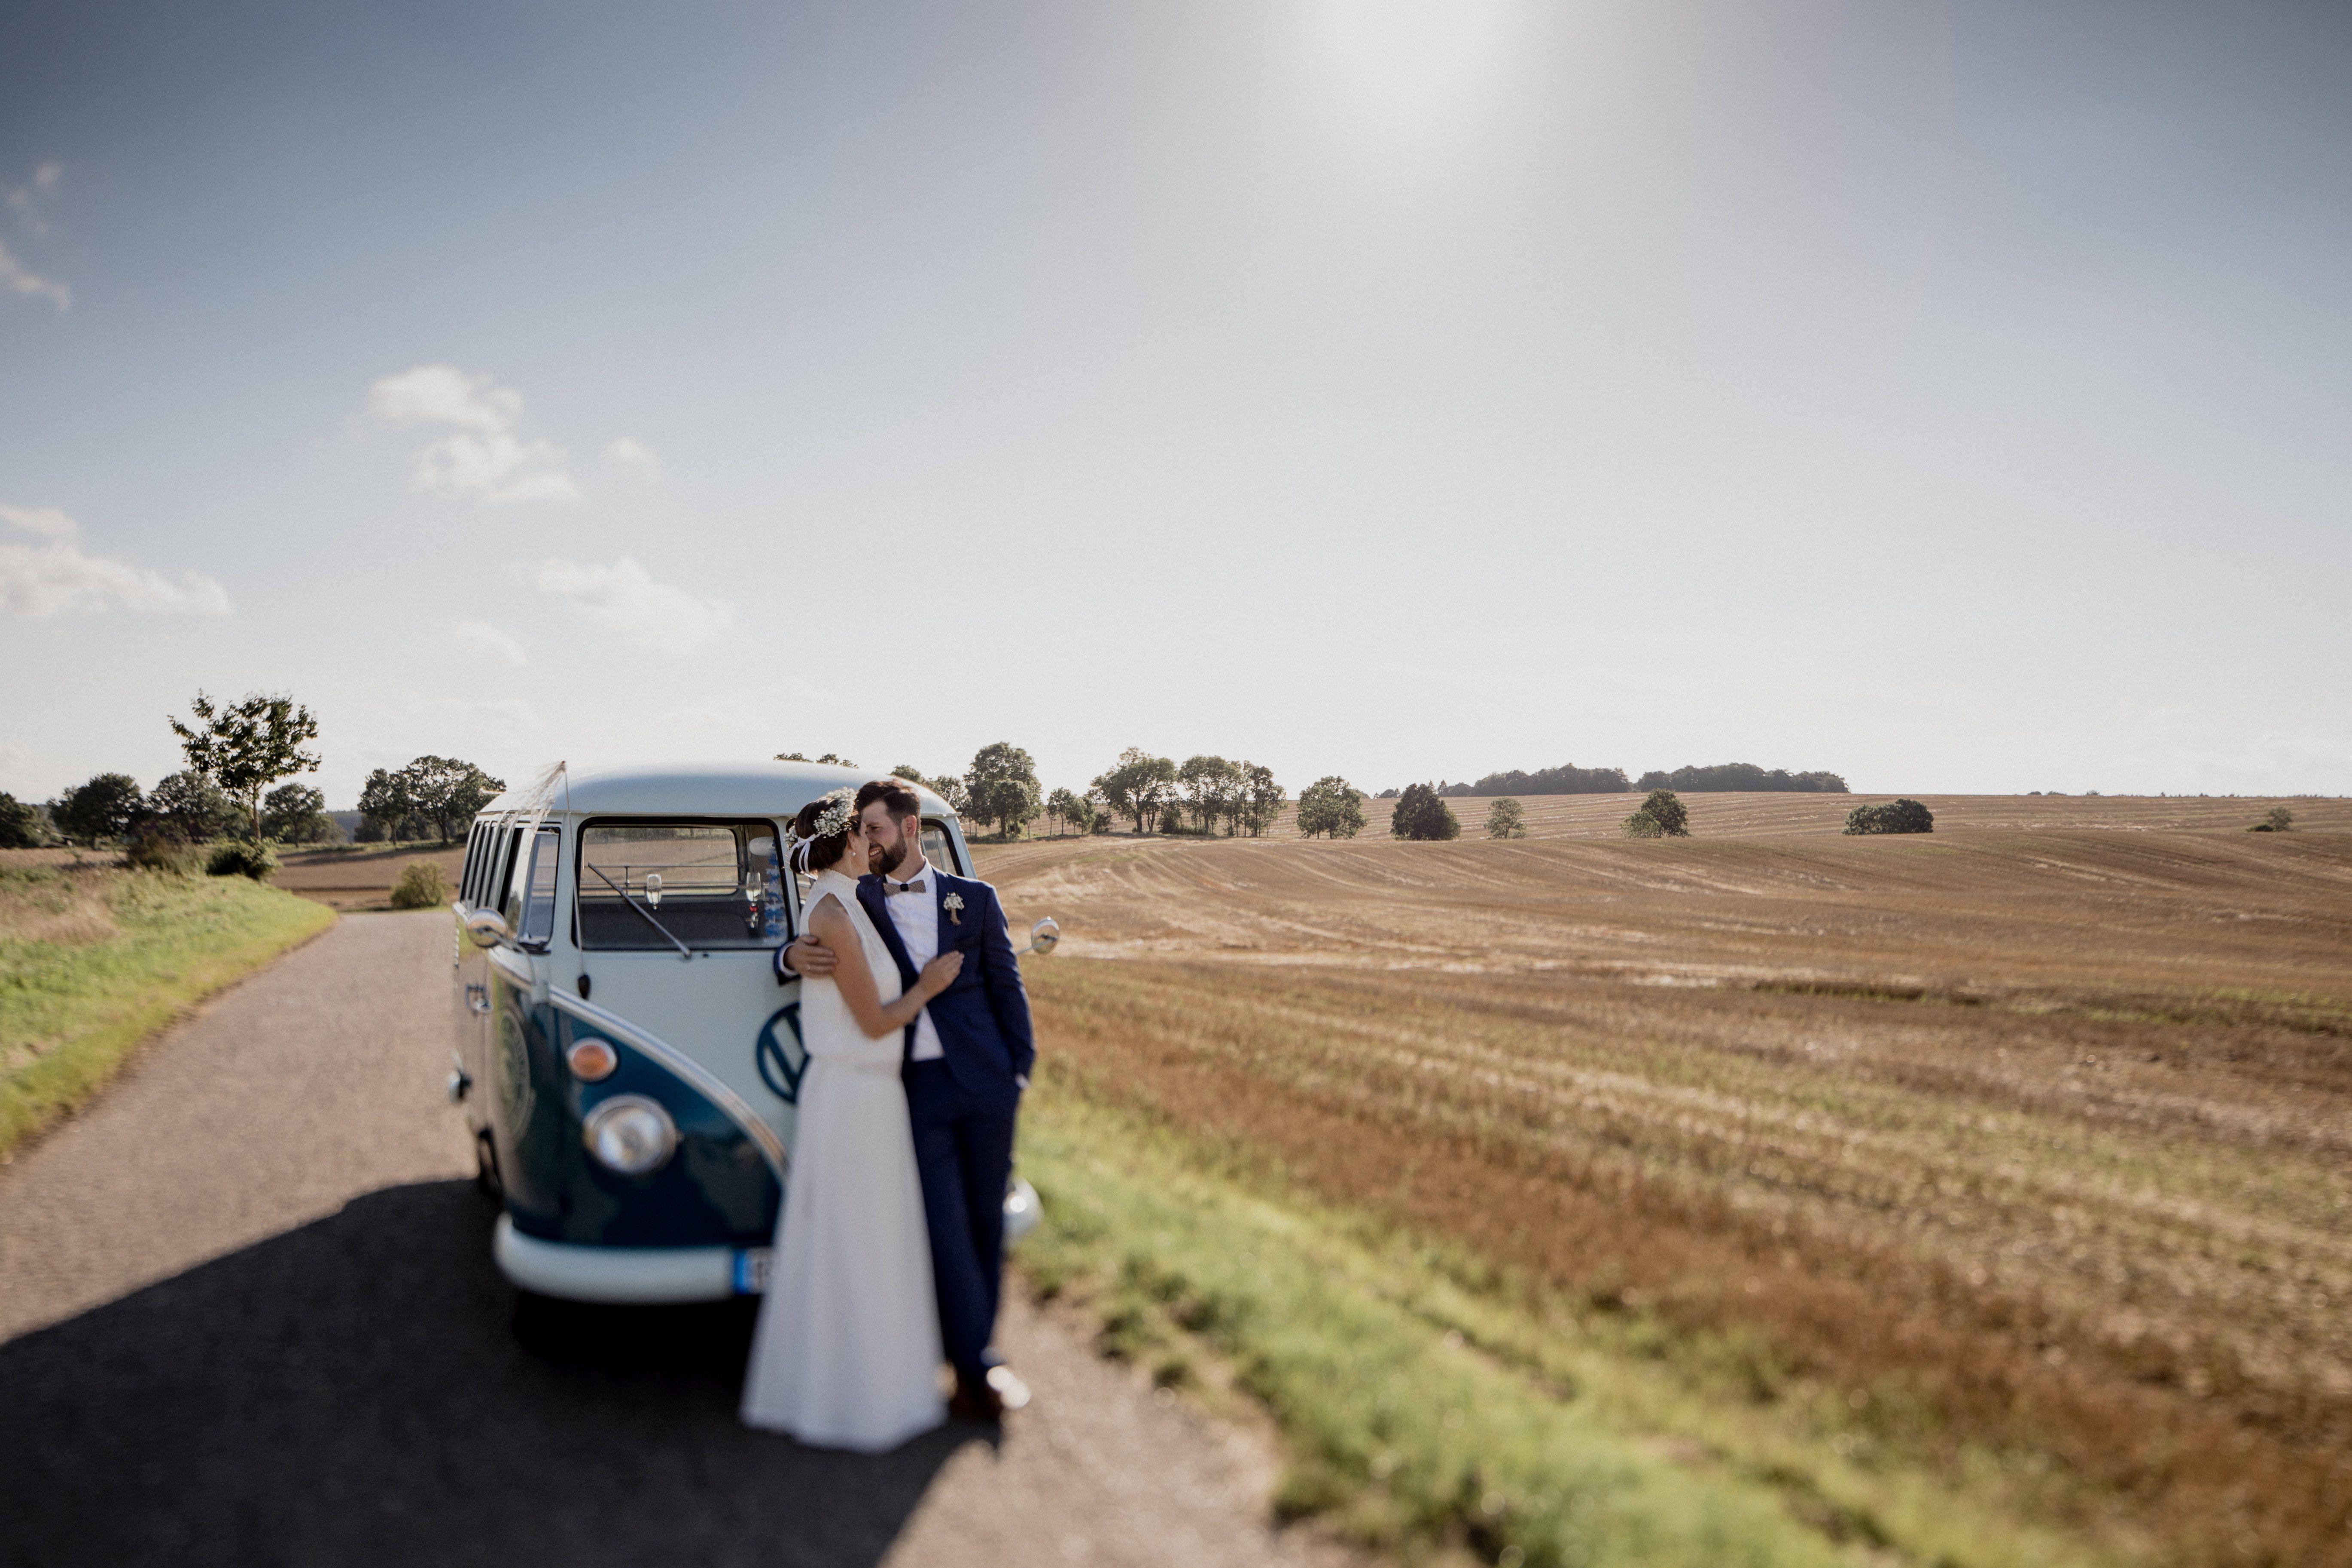 330-HochzeitMarieundJan-TomundLiaFotogr